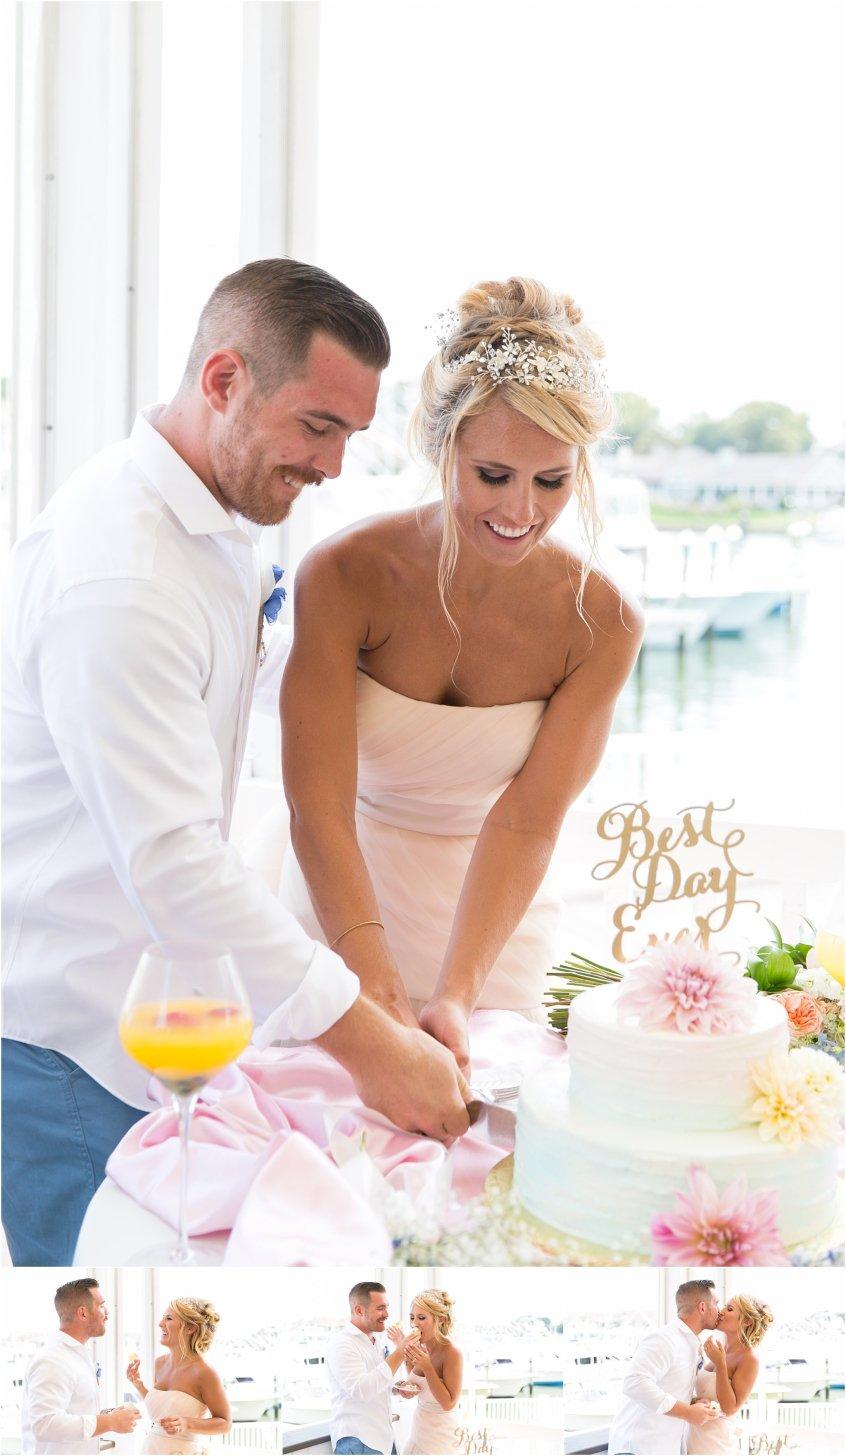 jessica_ryan_photography_virginia_beach_water_tabe_wedding_vera_wang_wedding_dress_0651